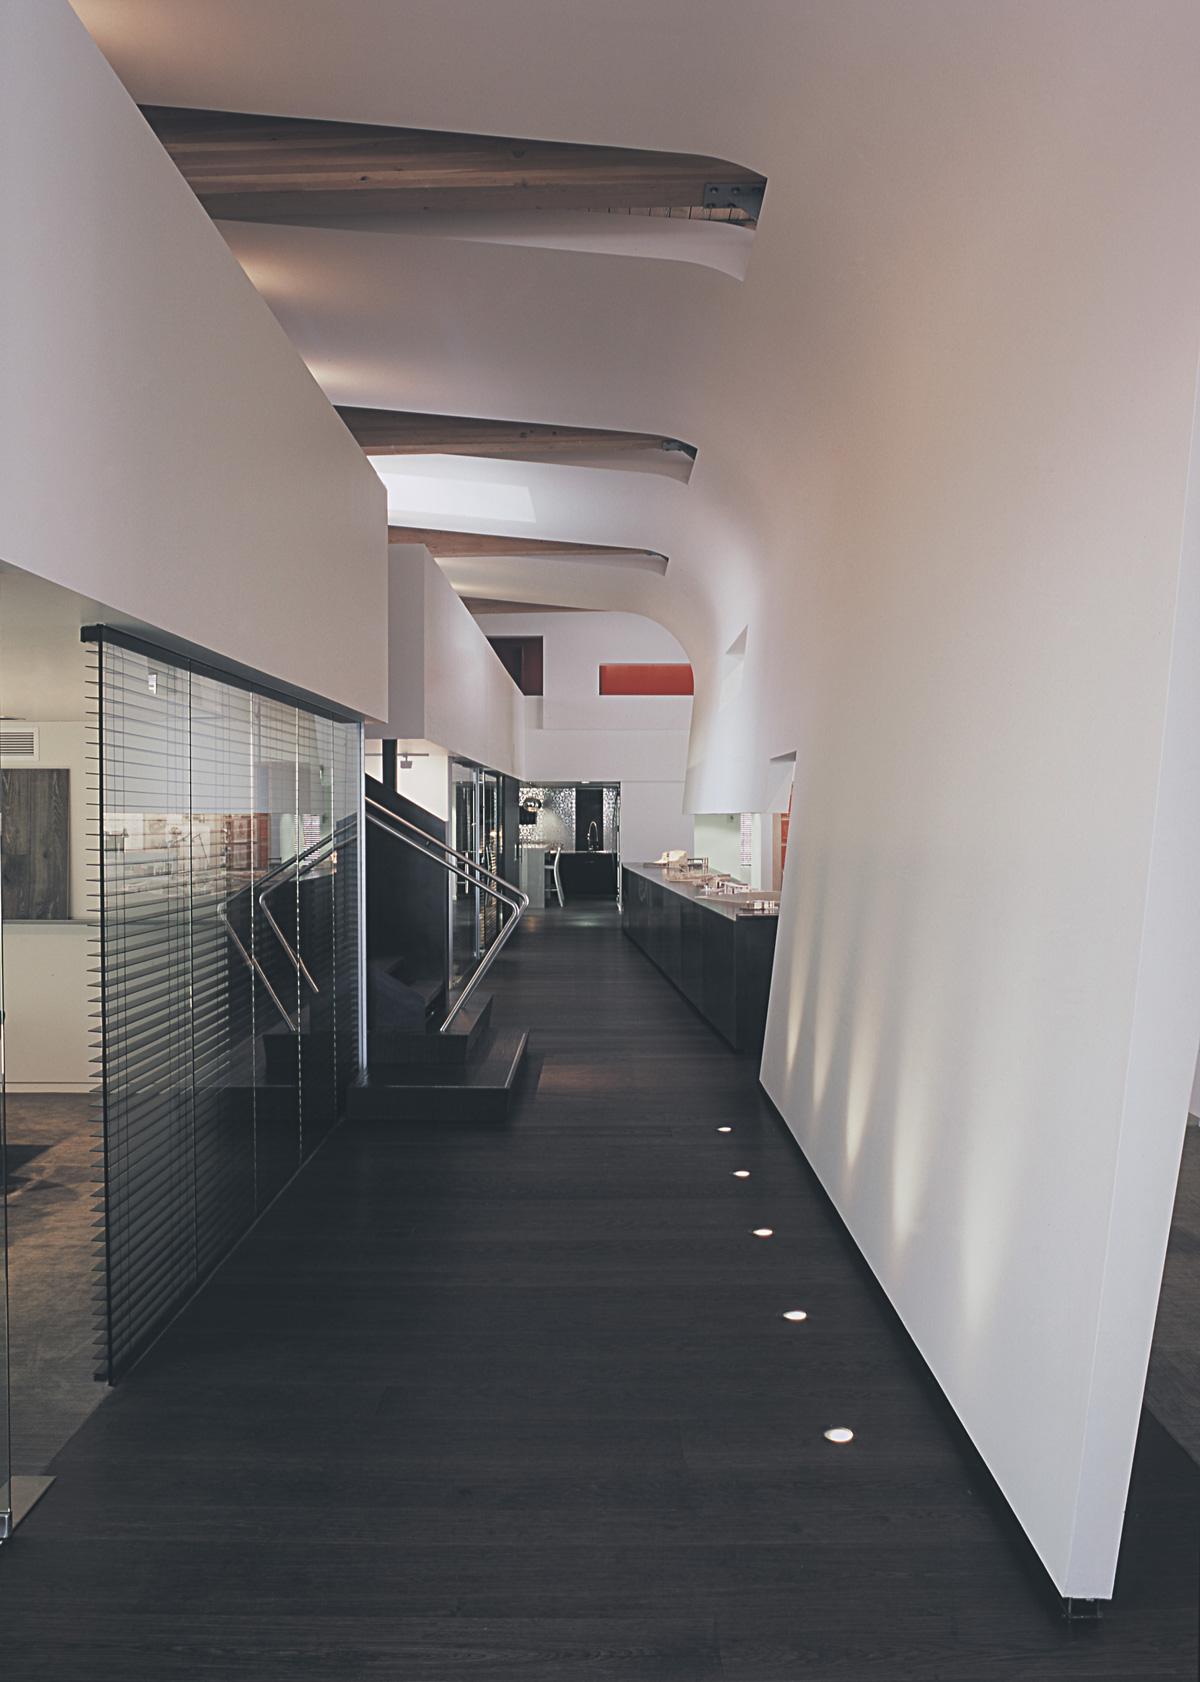 SkB studious interior hallway